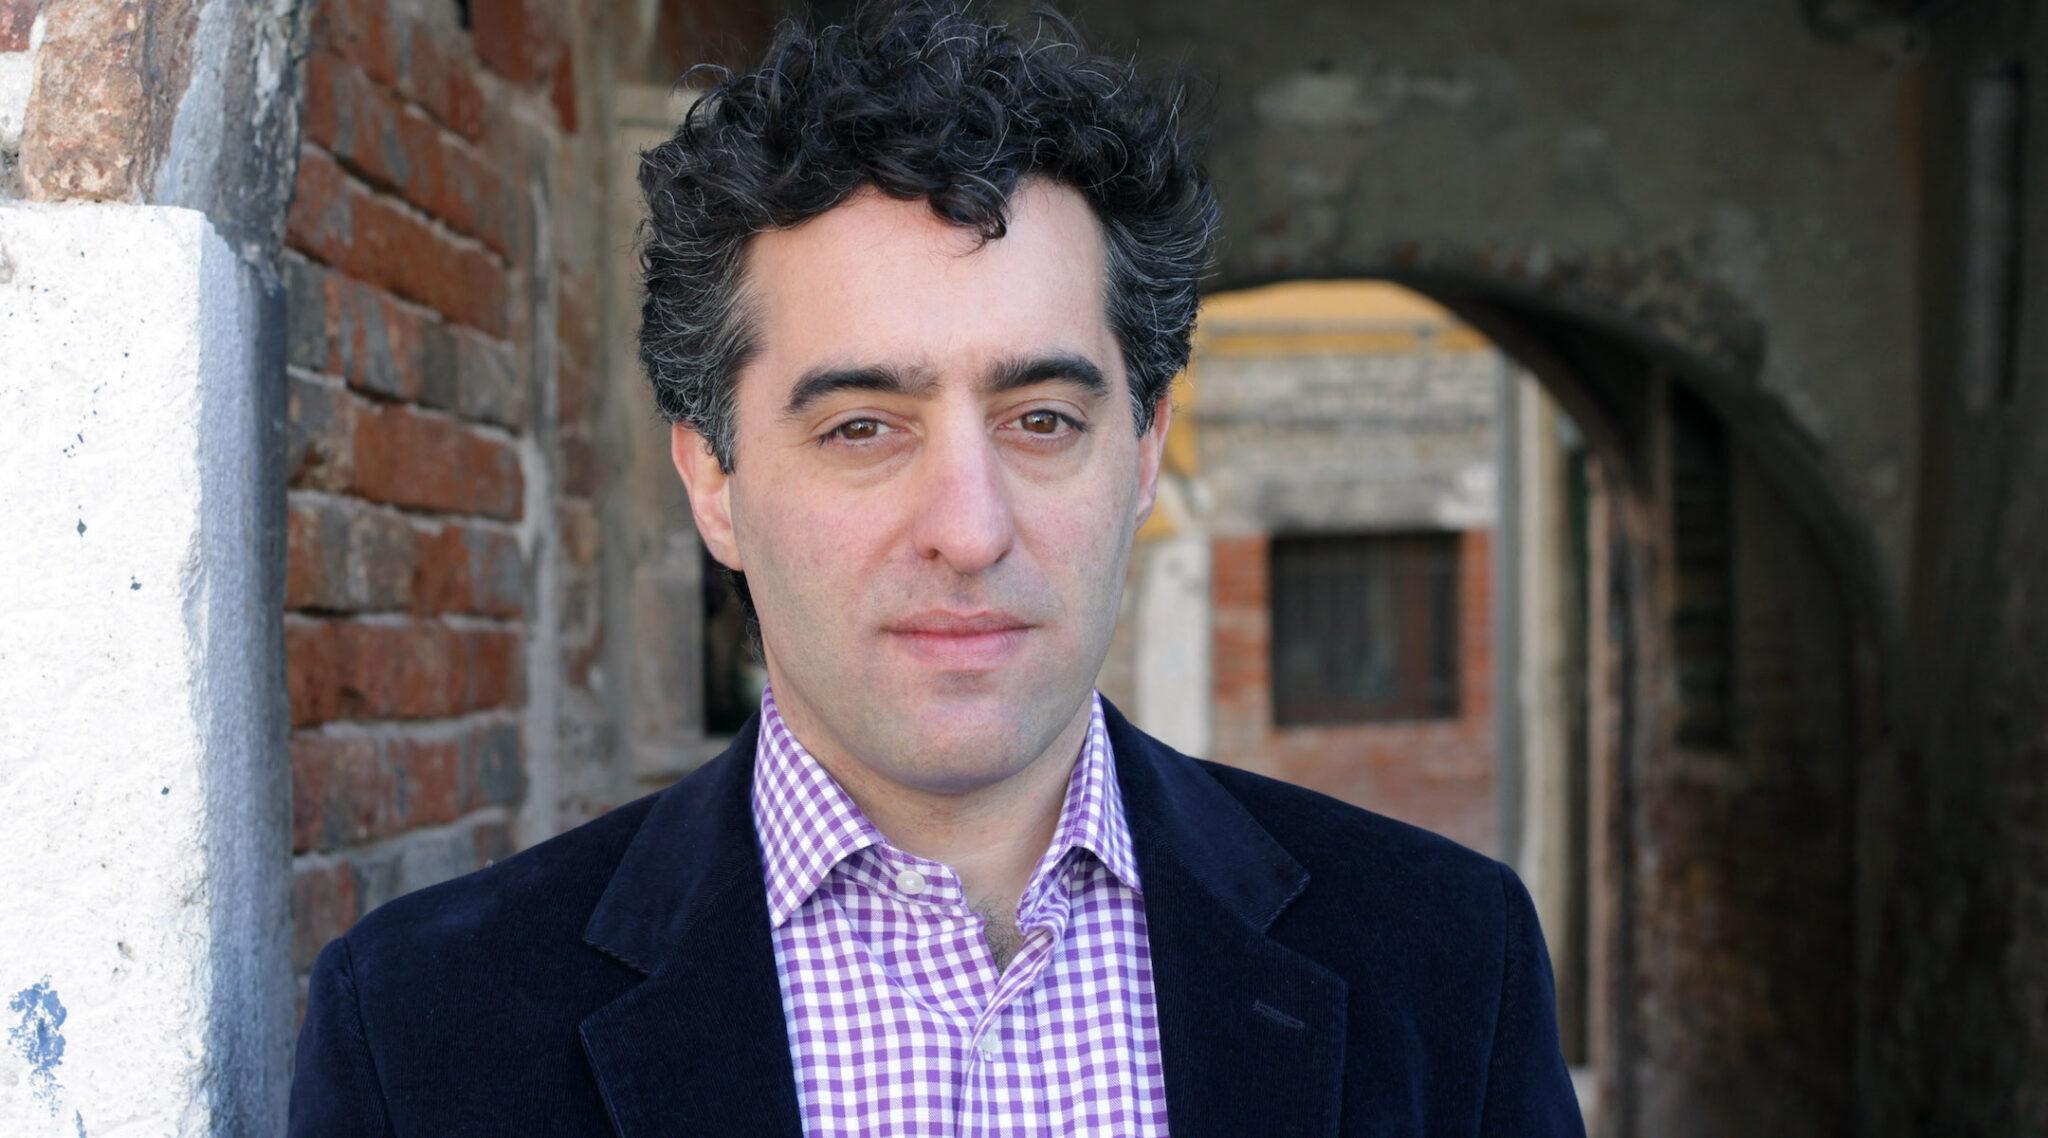 Nathan Englander poses at the Venice Literary Festival, April 15, 2011. (Photo/JTA-Barbara Zanon-Getty Images)